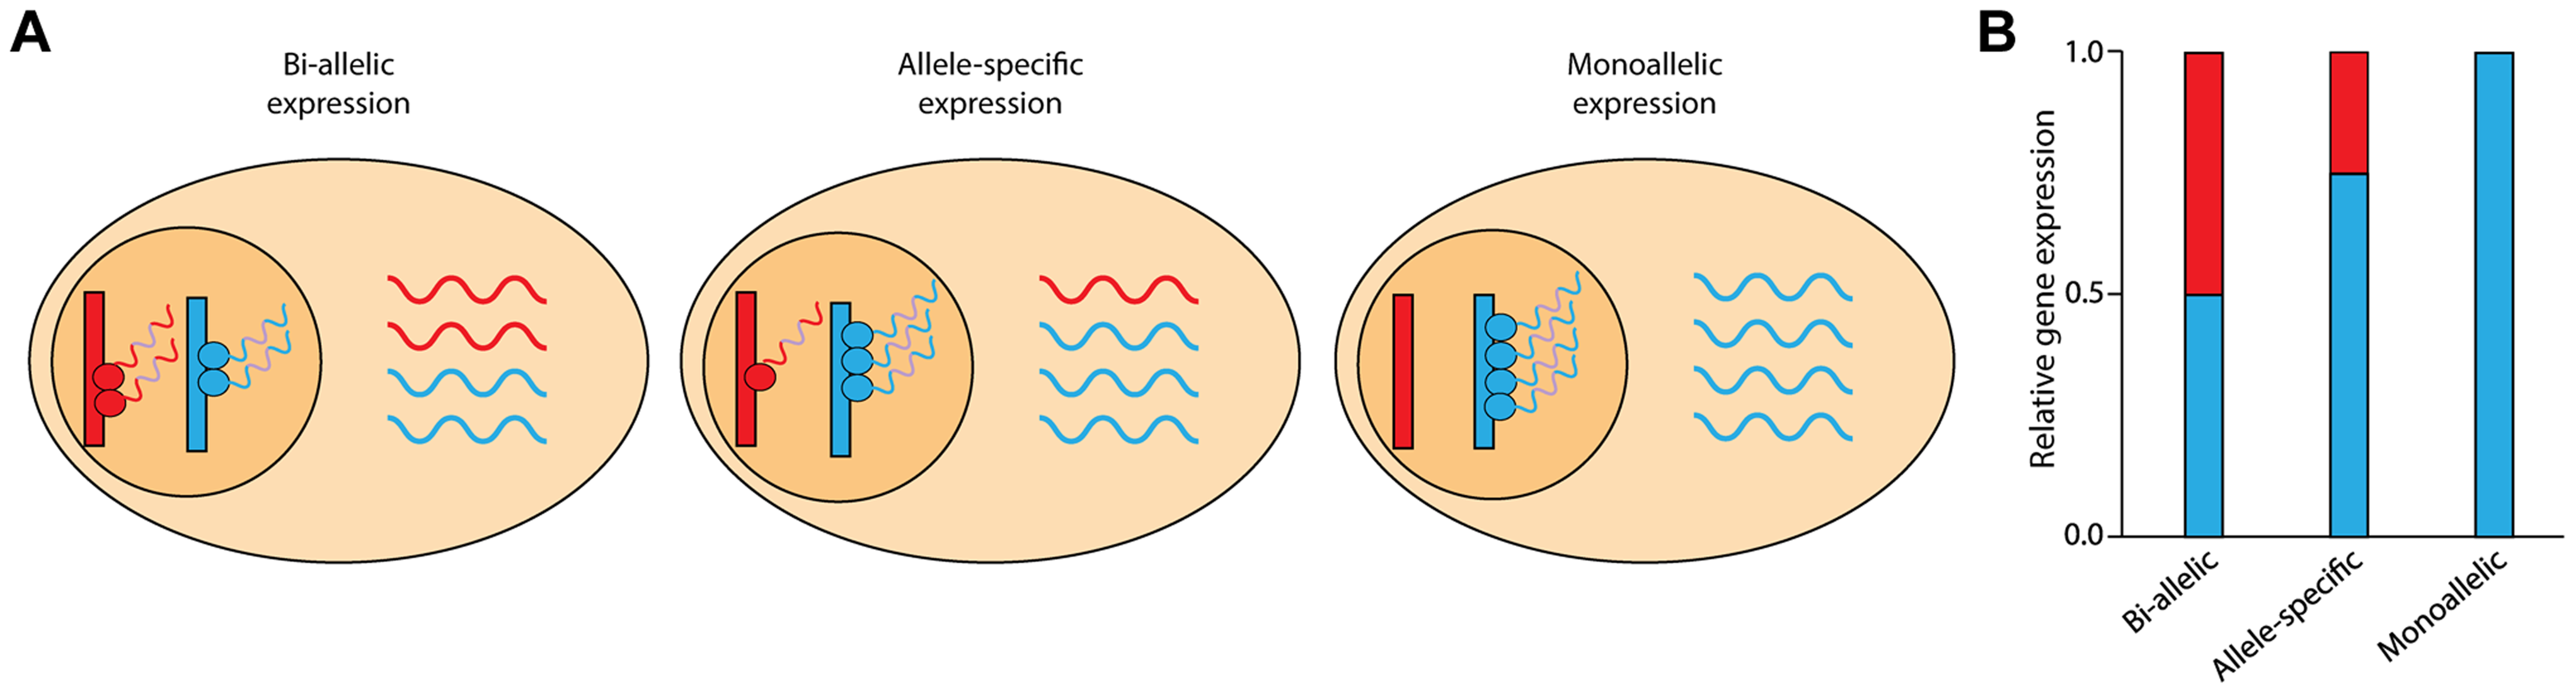 Schematic of allele-specific expression.